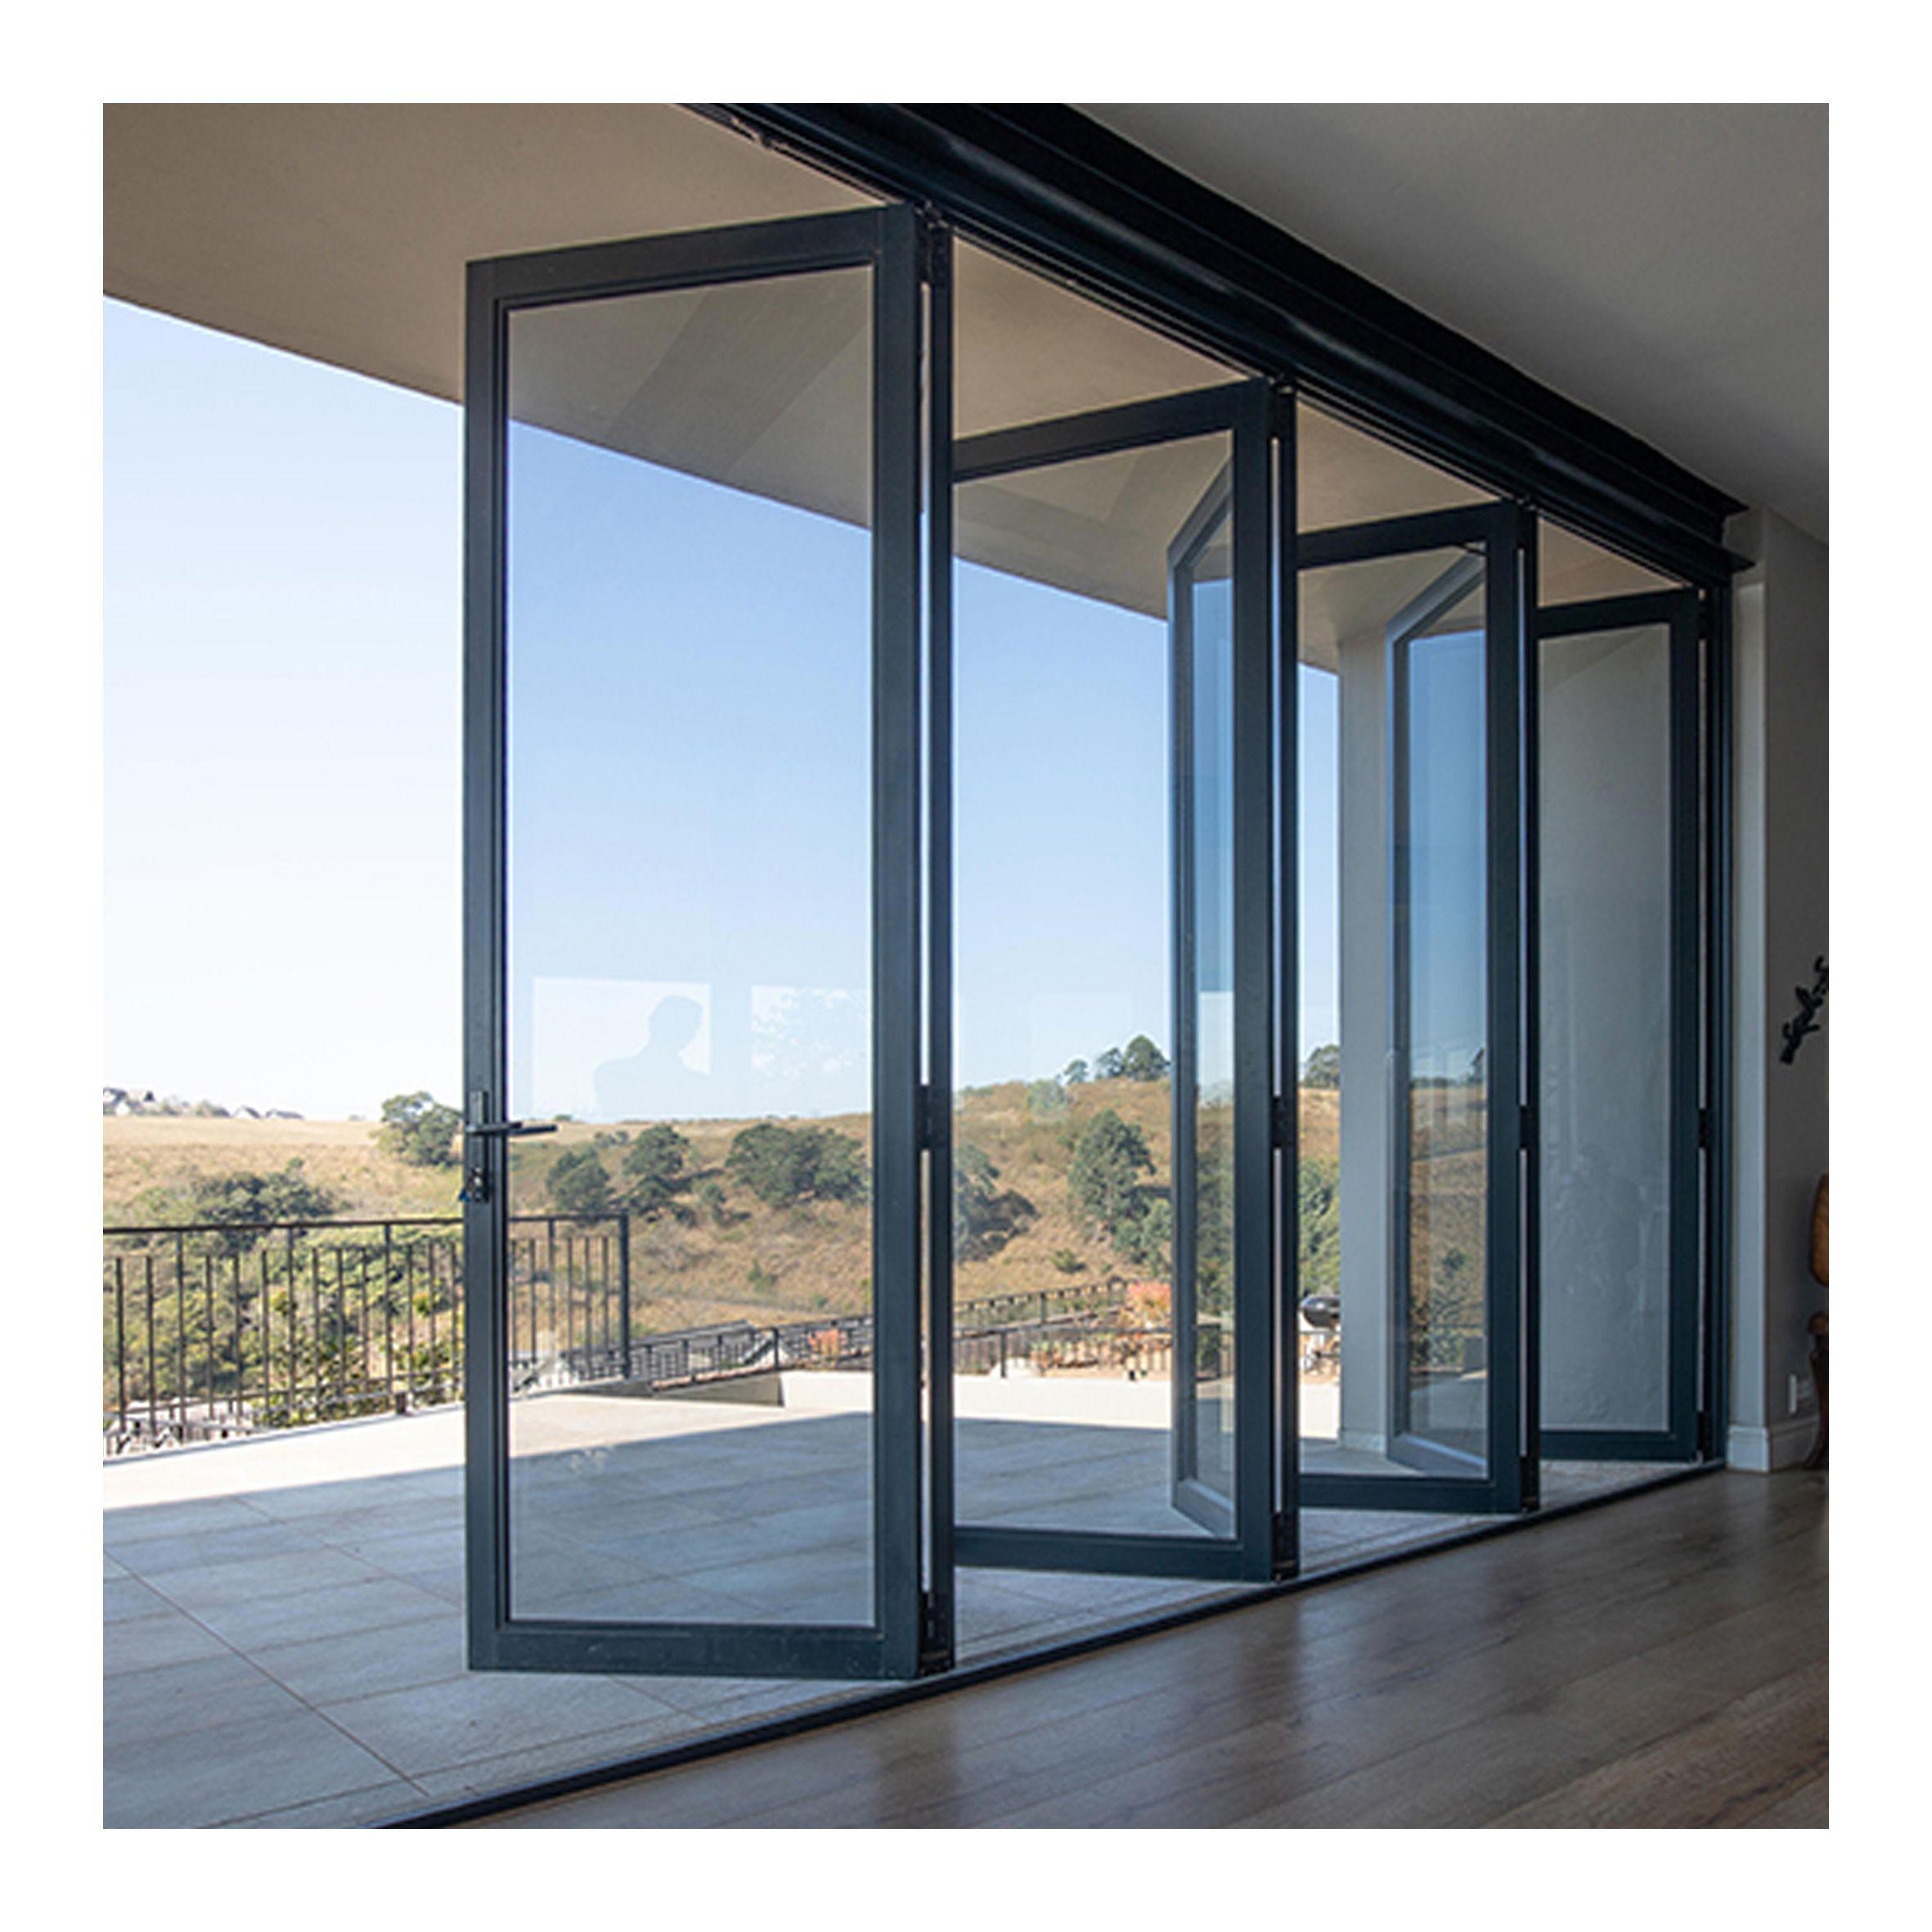 BARON Certified by Australian Glass & Window Association Supply Cheap Double Glazed Aluminium bifold door